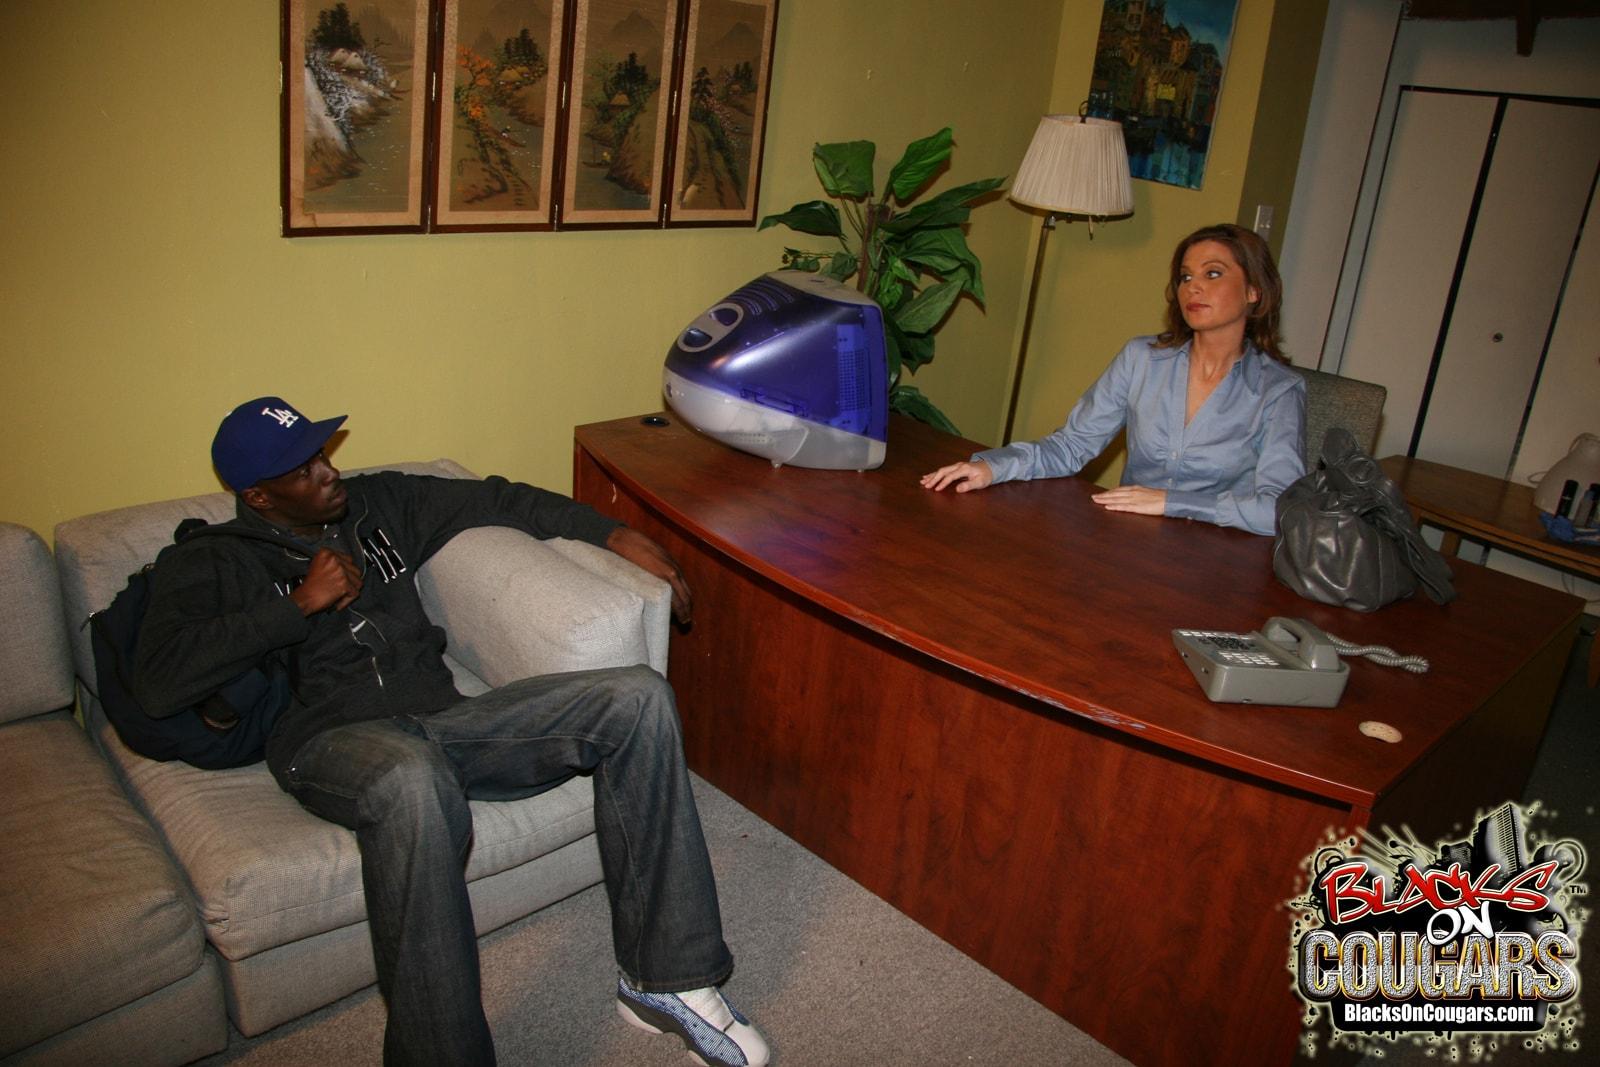 Dogfart '- Blacks On Cougars' starring Rae Rogers (Photo 4)